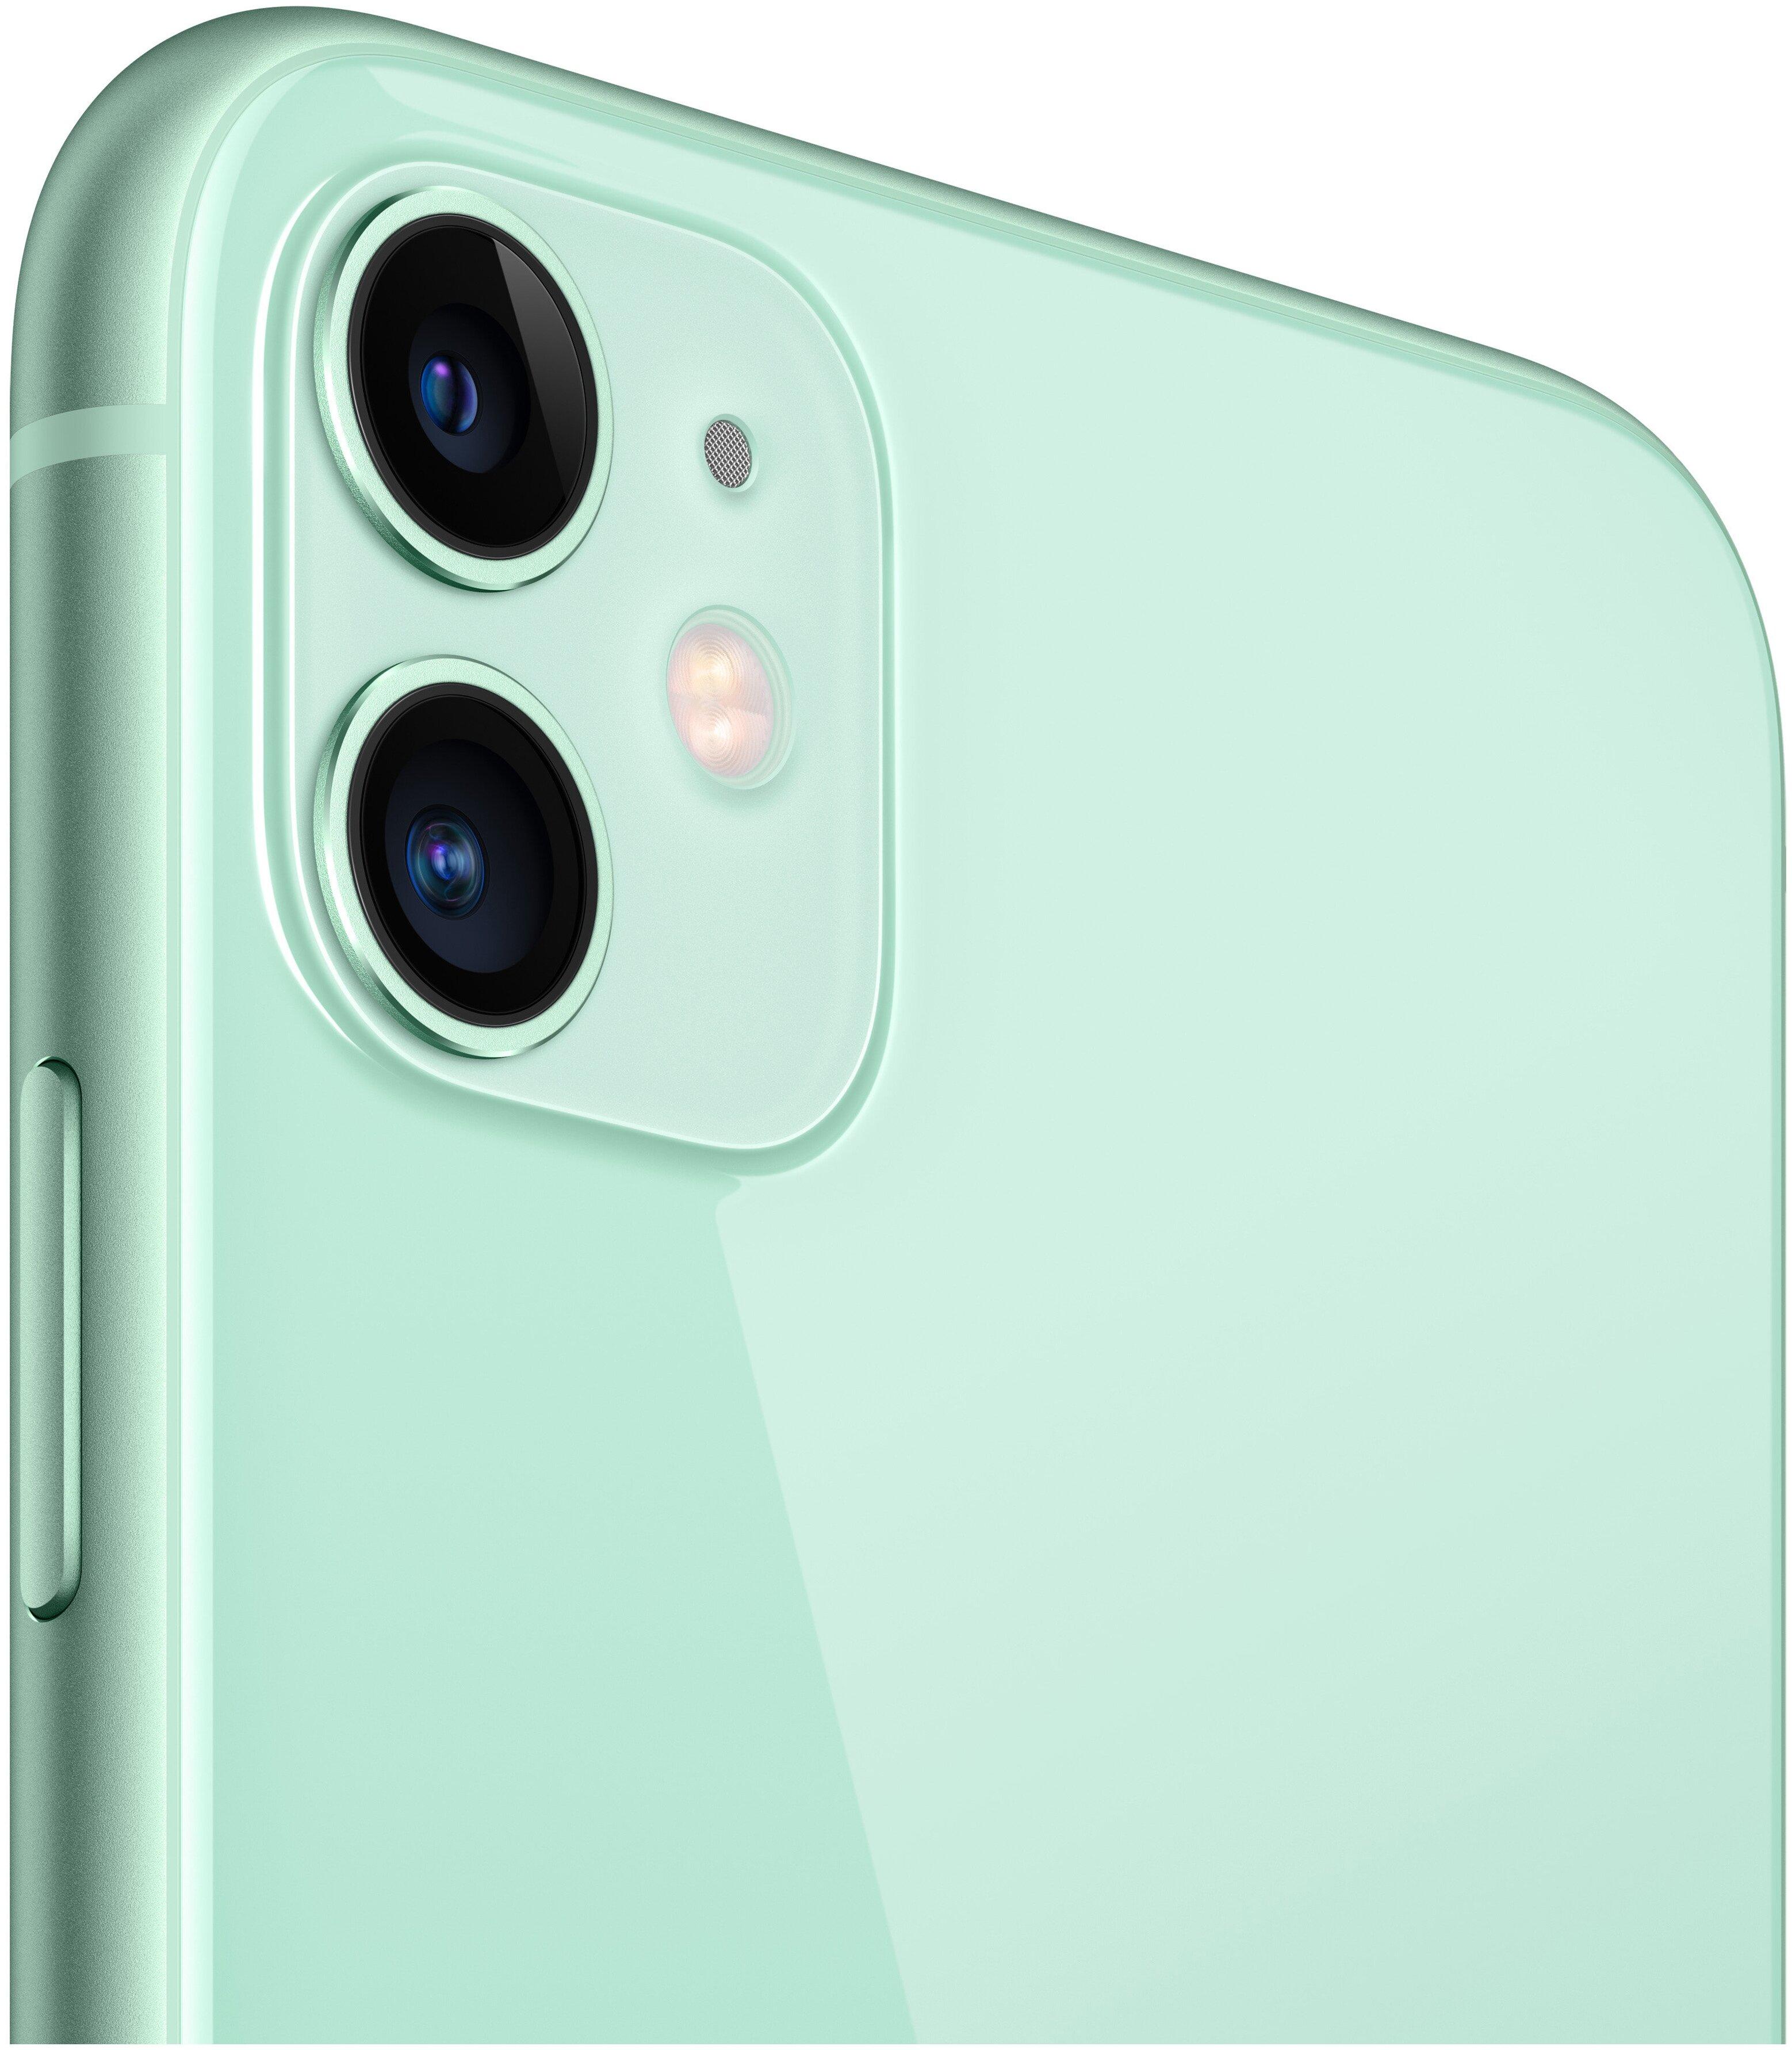 Apple iPhone 11 64GB - вес: 194г